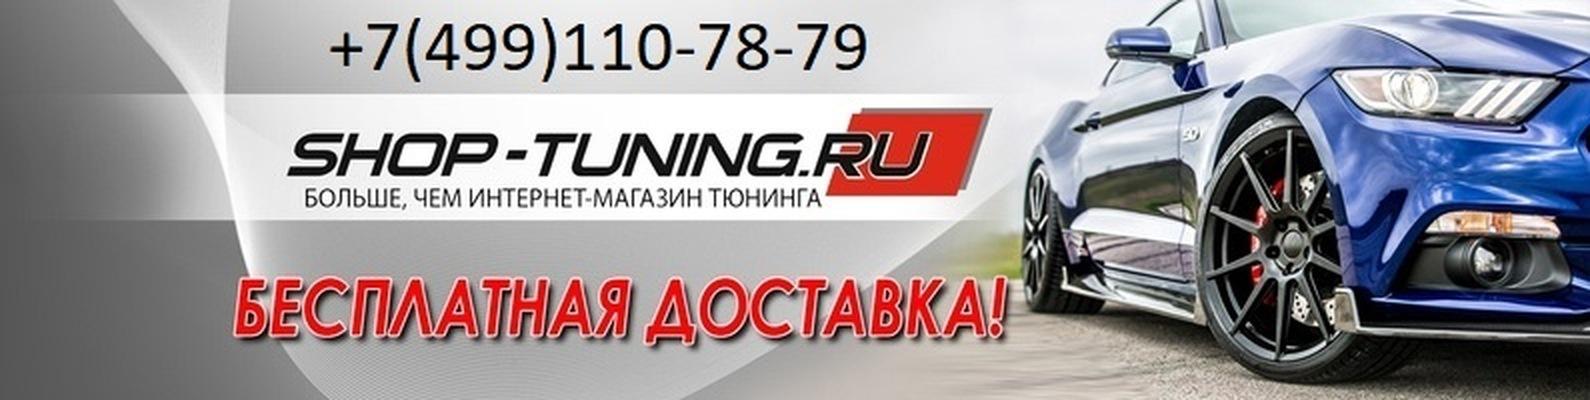 Shop-Tuning — тюнинг, Москва. СТО.   ВКонтакте 83a10c890d2